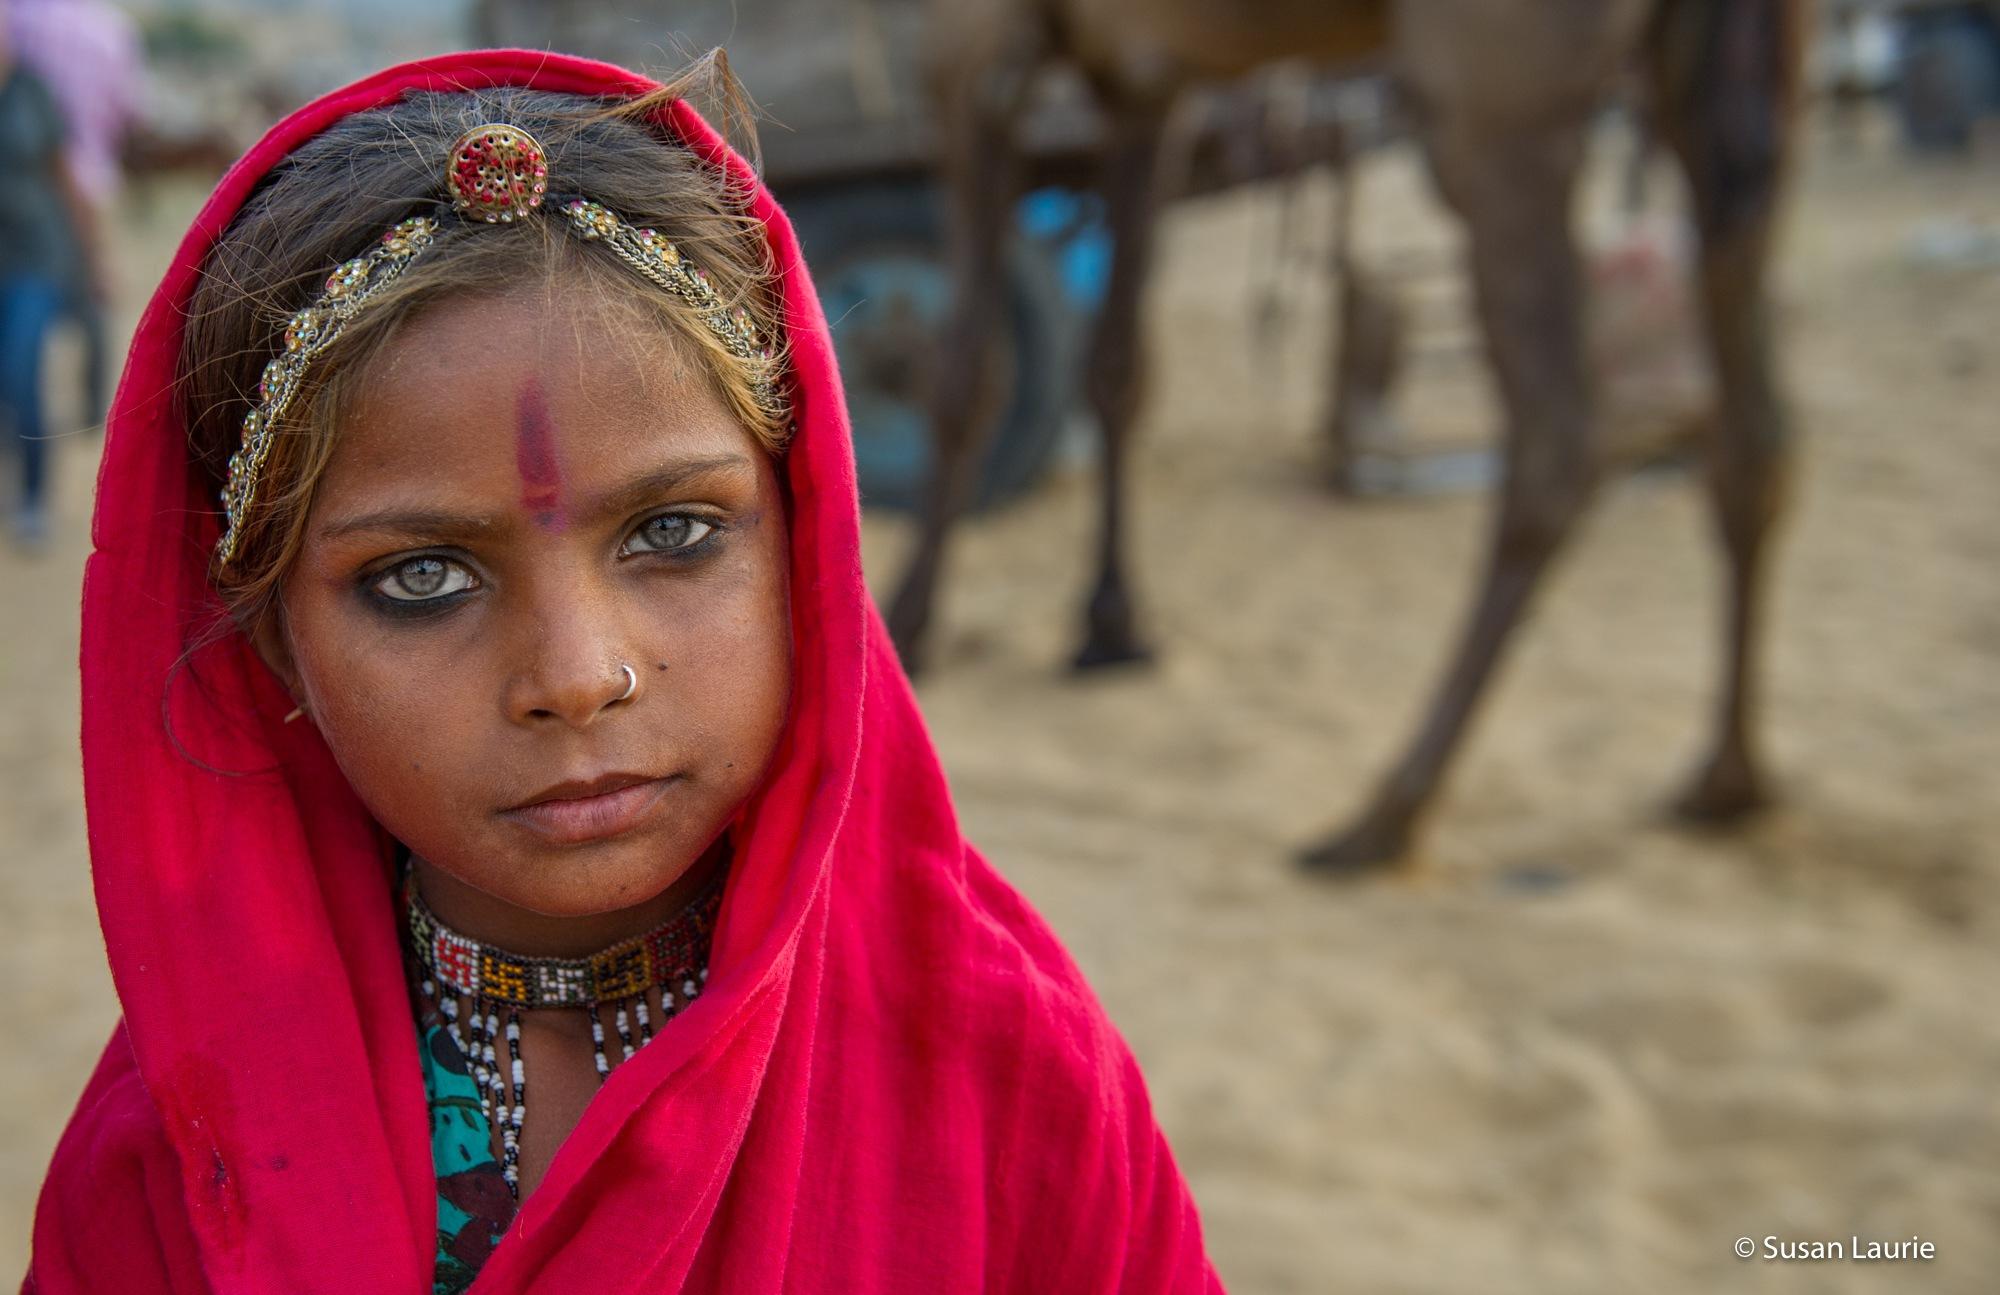 Pushkar India Portraits by Susan Laurie